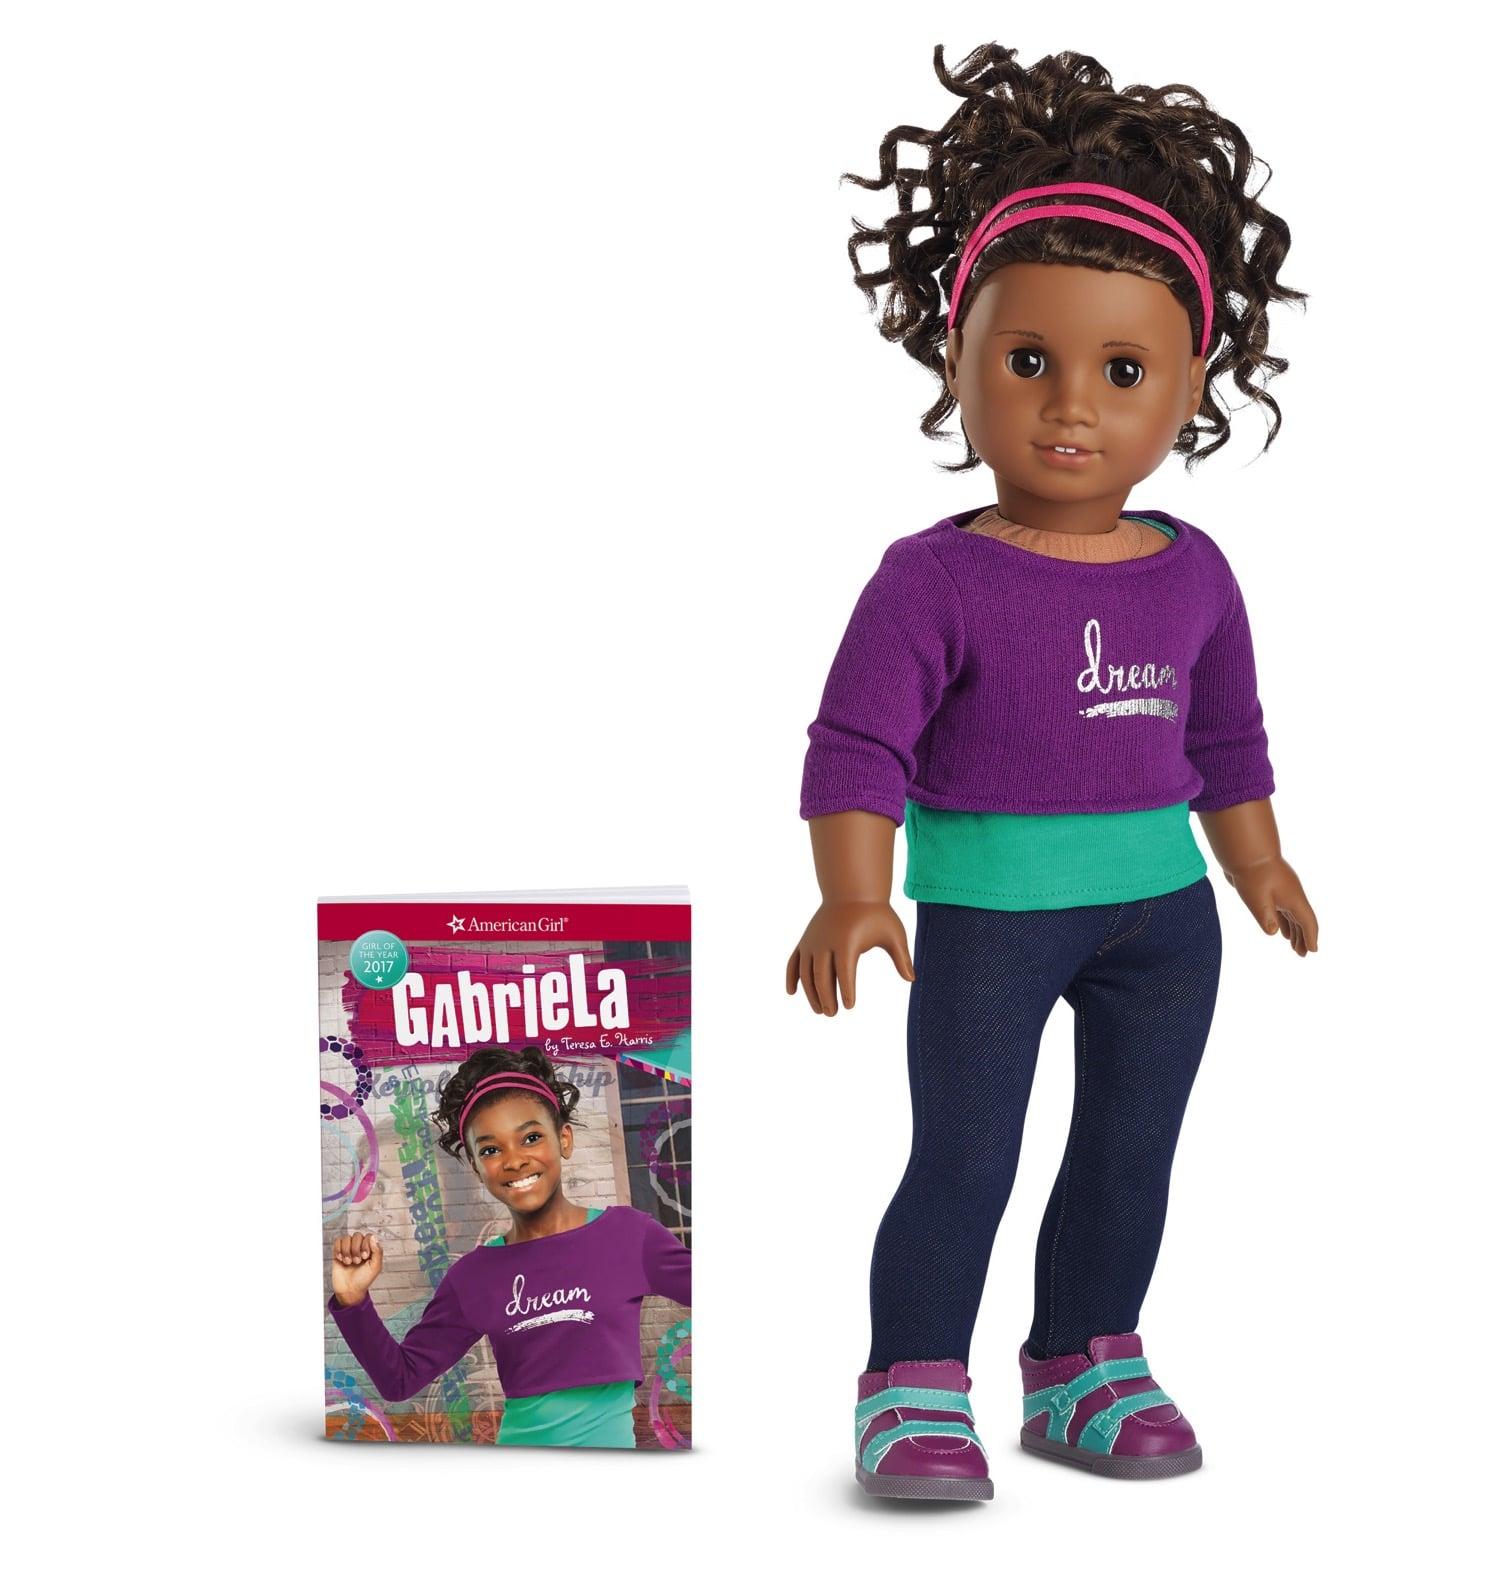 Gabriela Doll and Book LR